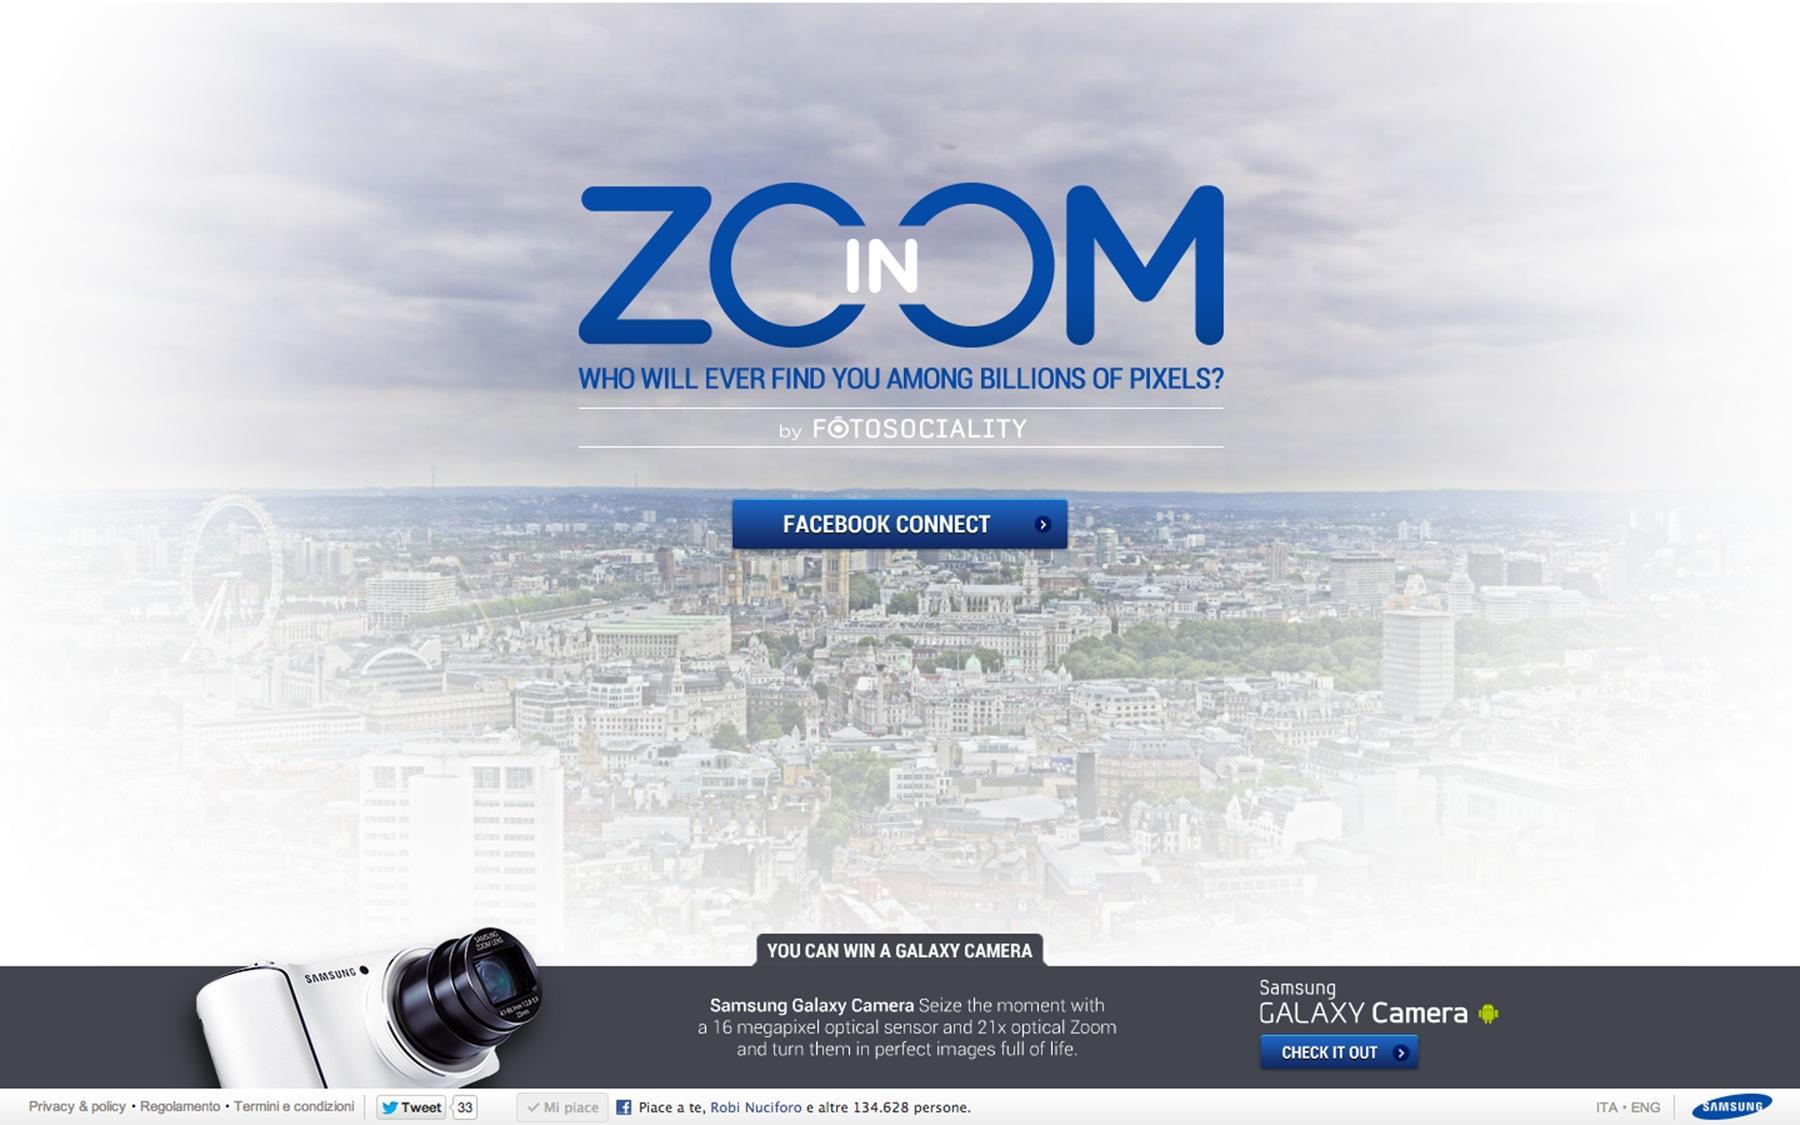 Samsung Digital Ad -  Zoom-in by Fotosociality